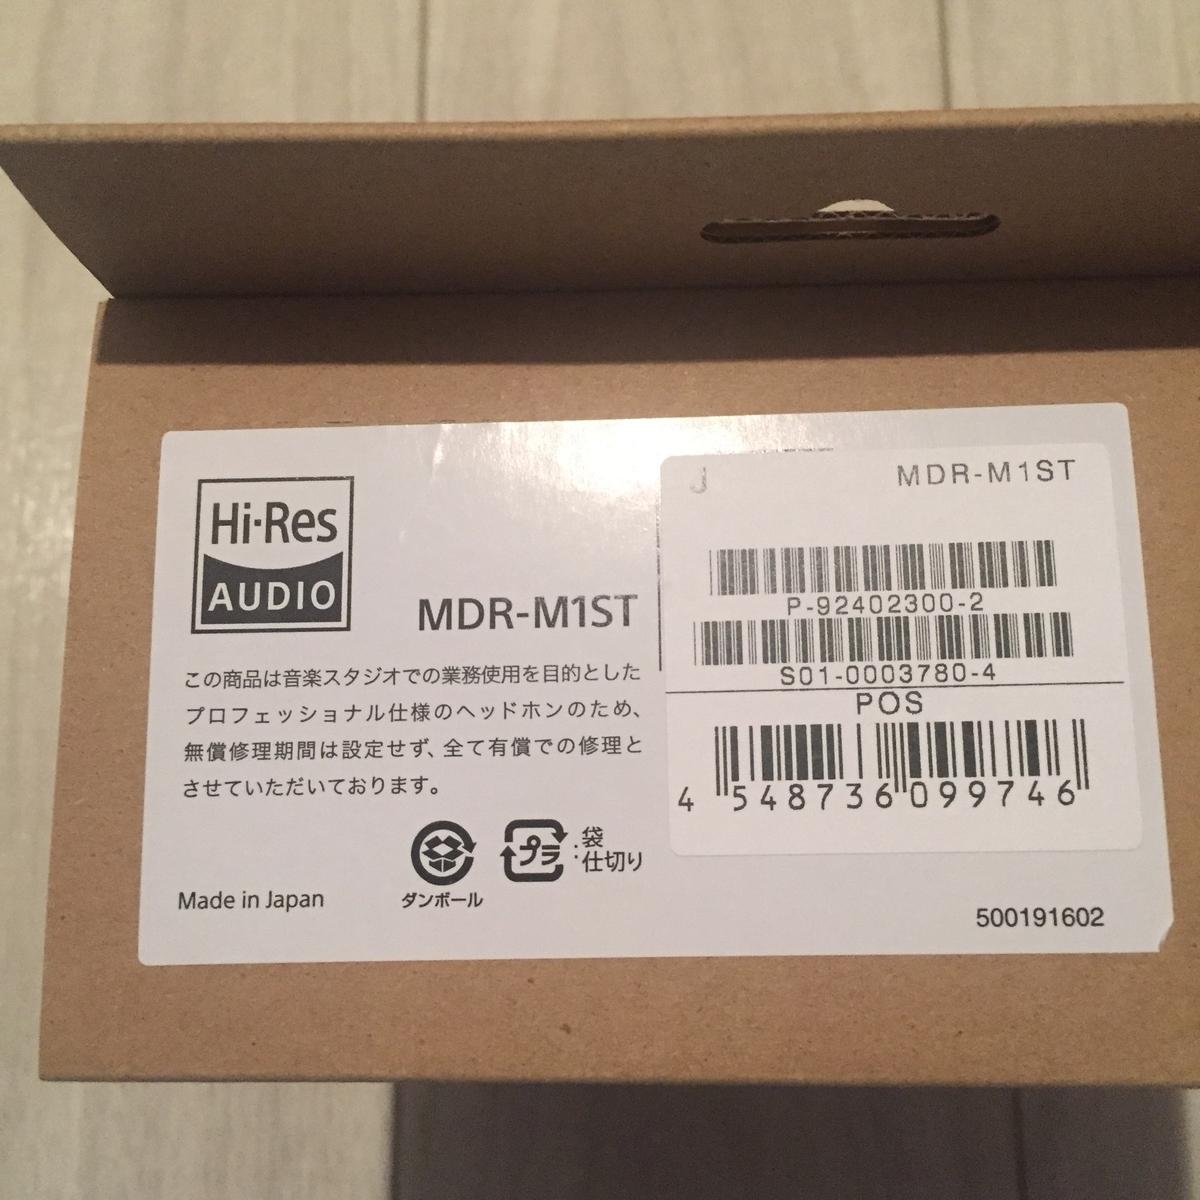 SONY MDR-M1ST ハイレゾ モニタリング DAW MIX師 MIX 歌 アーティスト